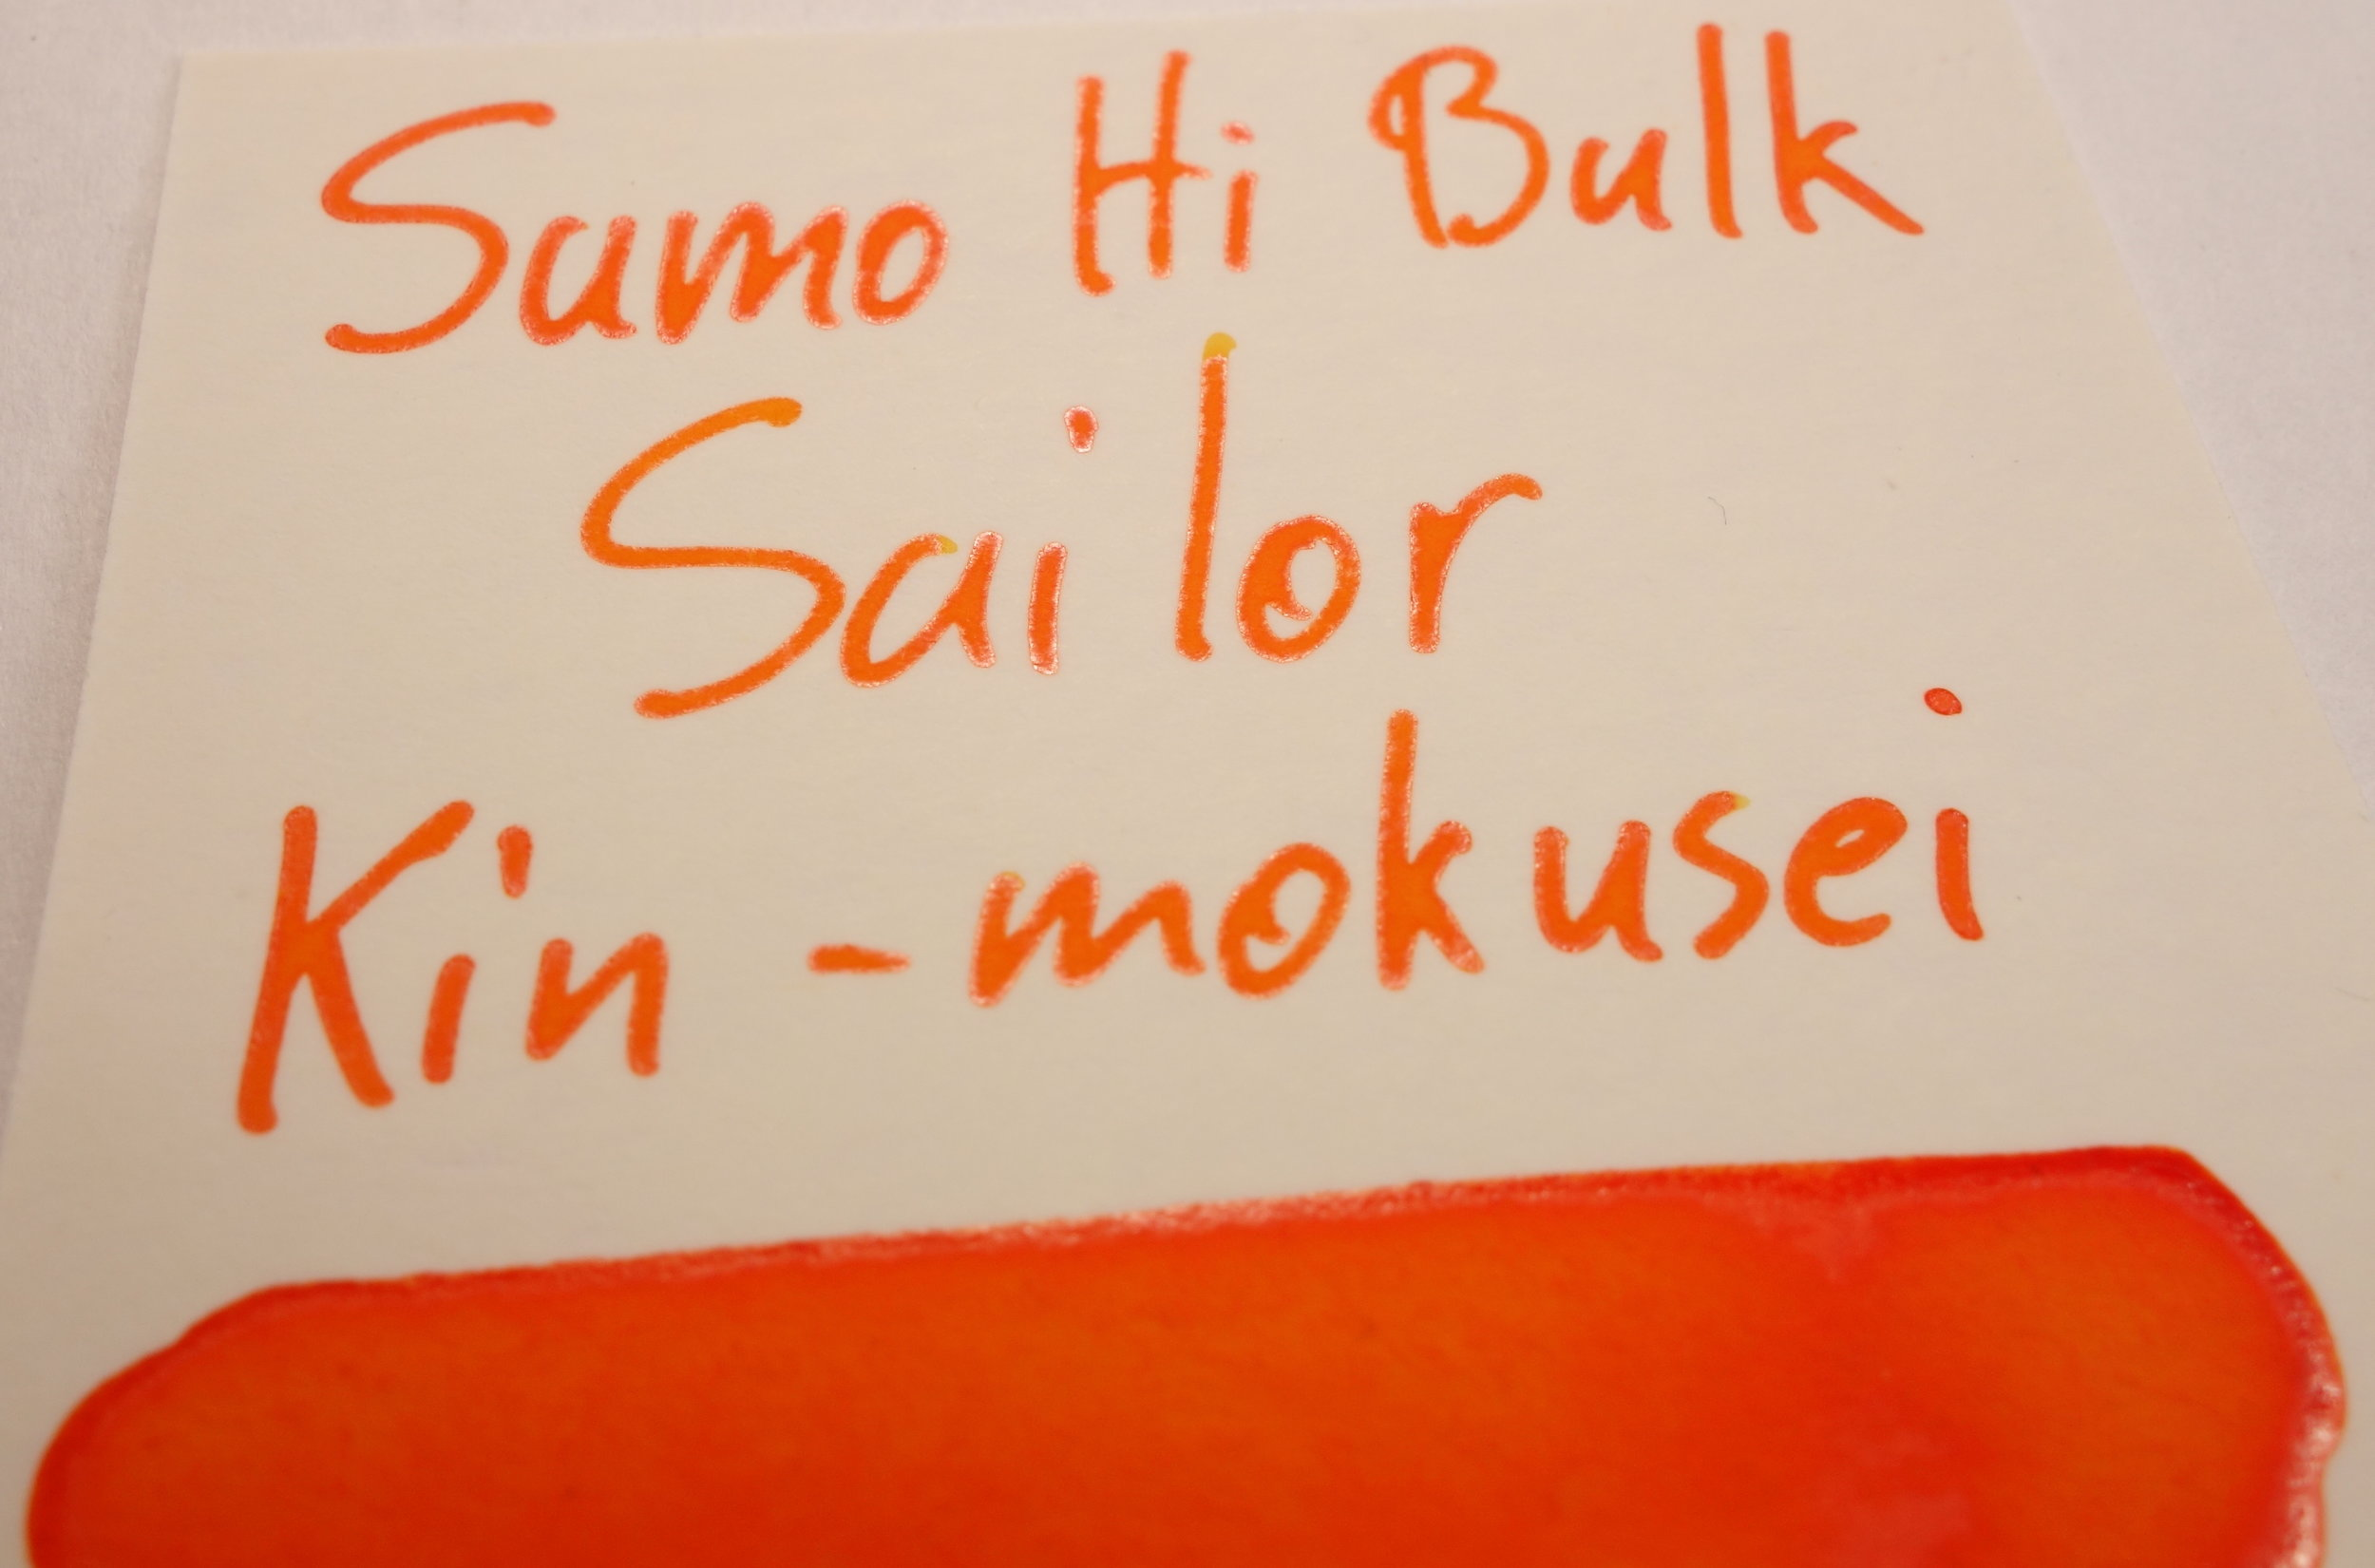 Sailor Kin-mokusei Sheen Sumo Hi Bulk.JPG